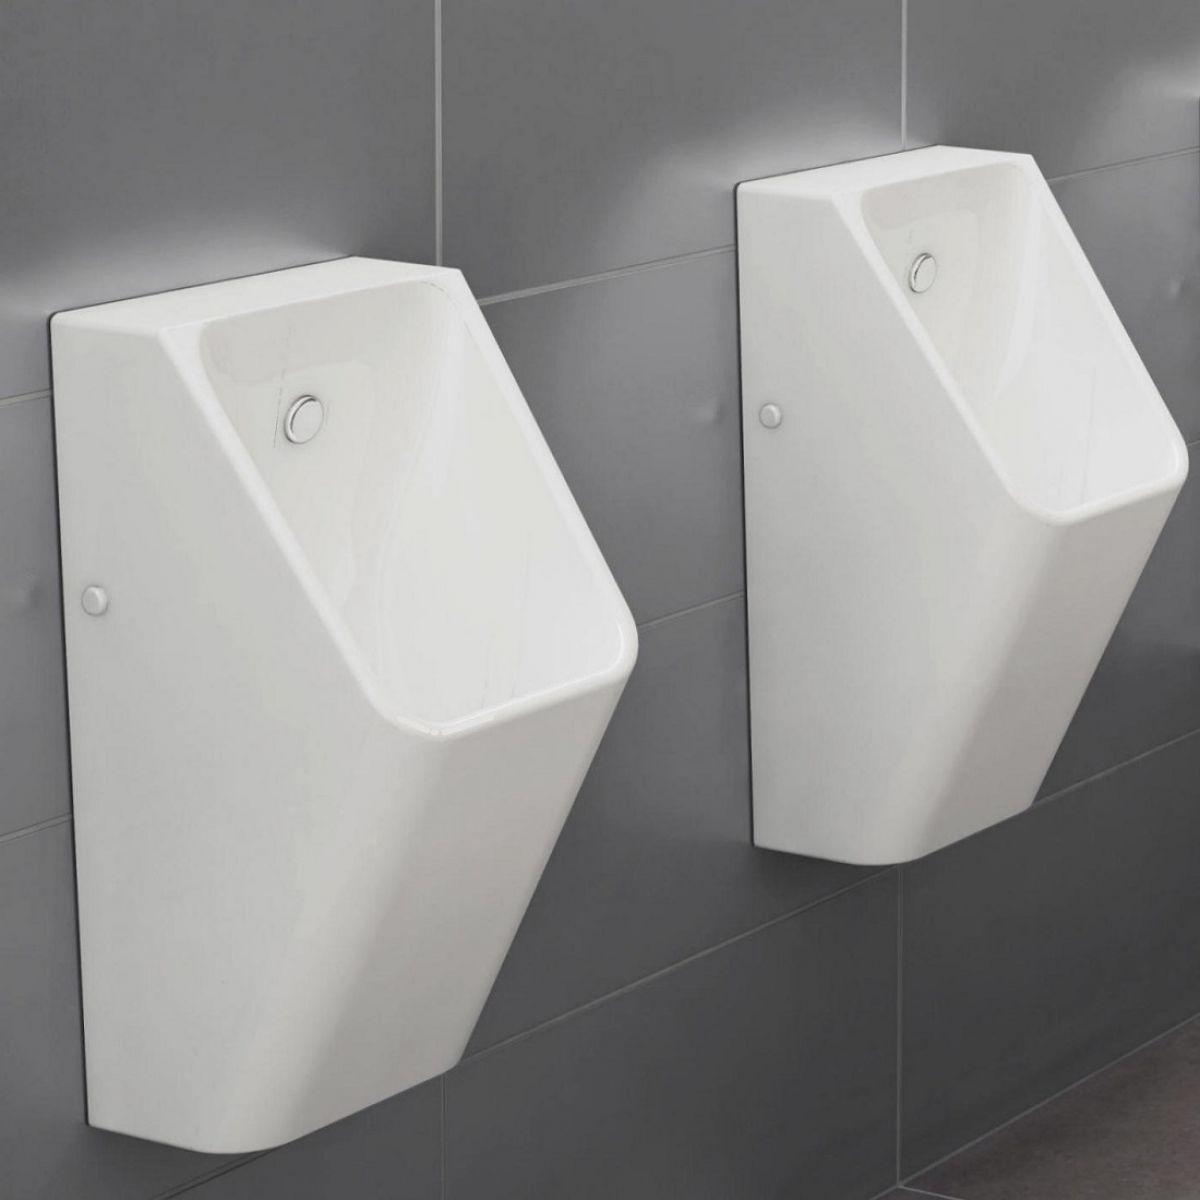 VitrA S20 Syphonic Urinal - 54610030199